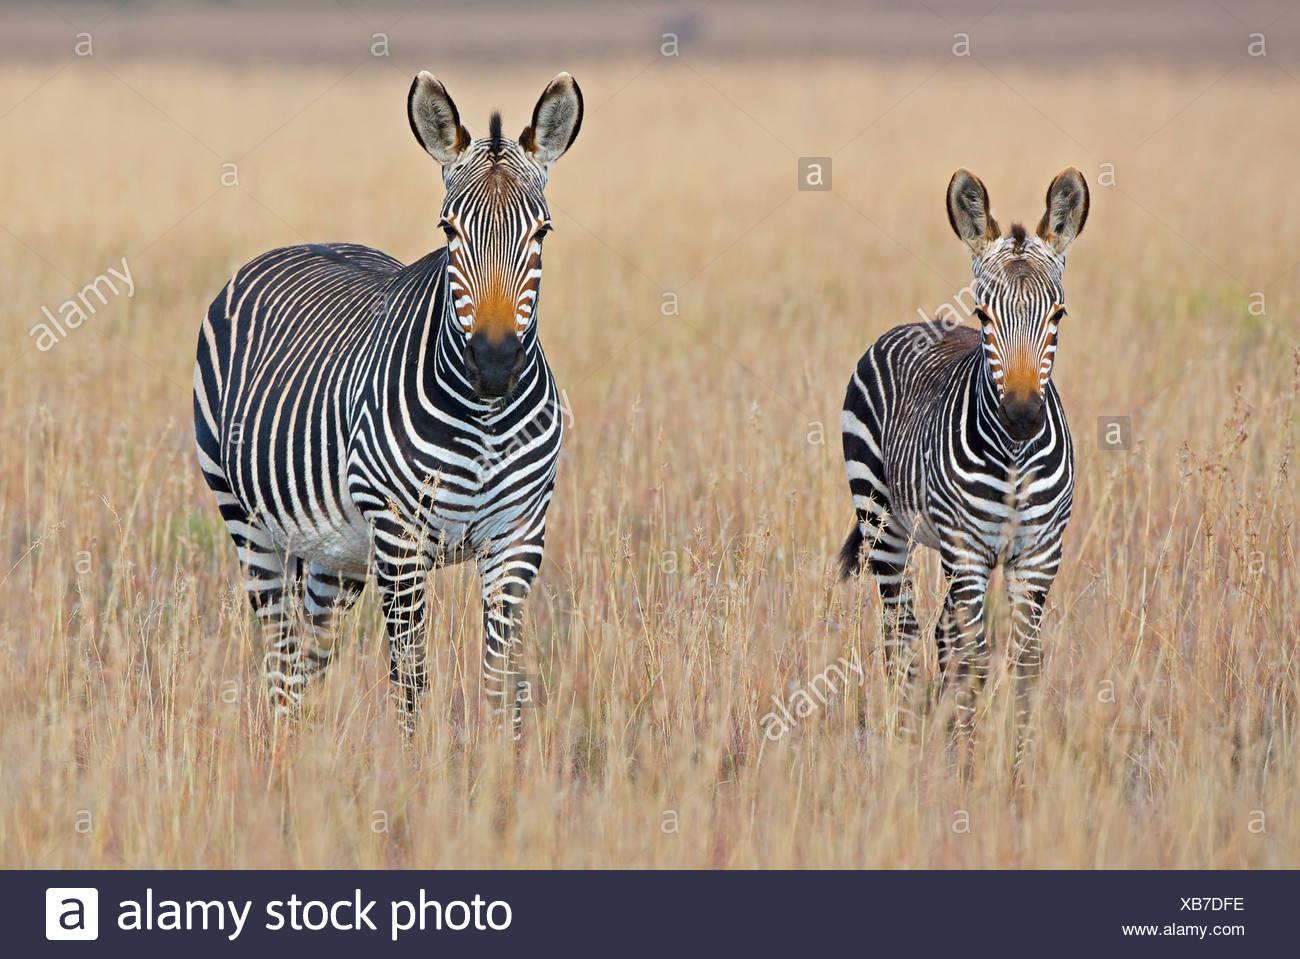 Llanuras cebra (Equus quagga) con potro en praderas, Mountain Zebra National Park, provincia de Eastern Cape, Sudáfrica Imagen De Stock